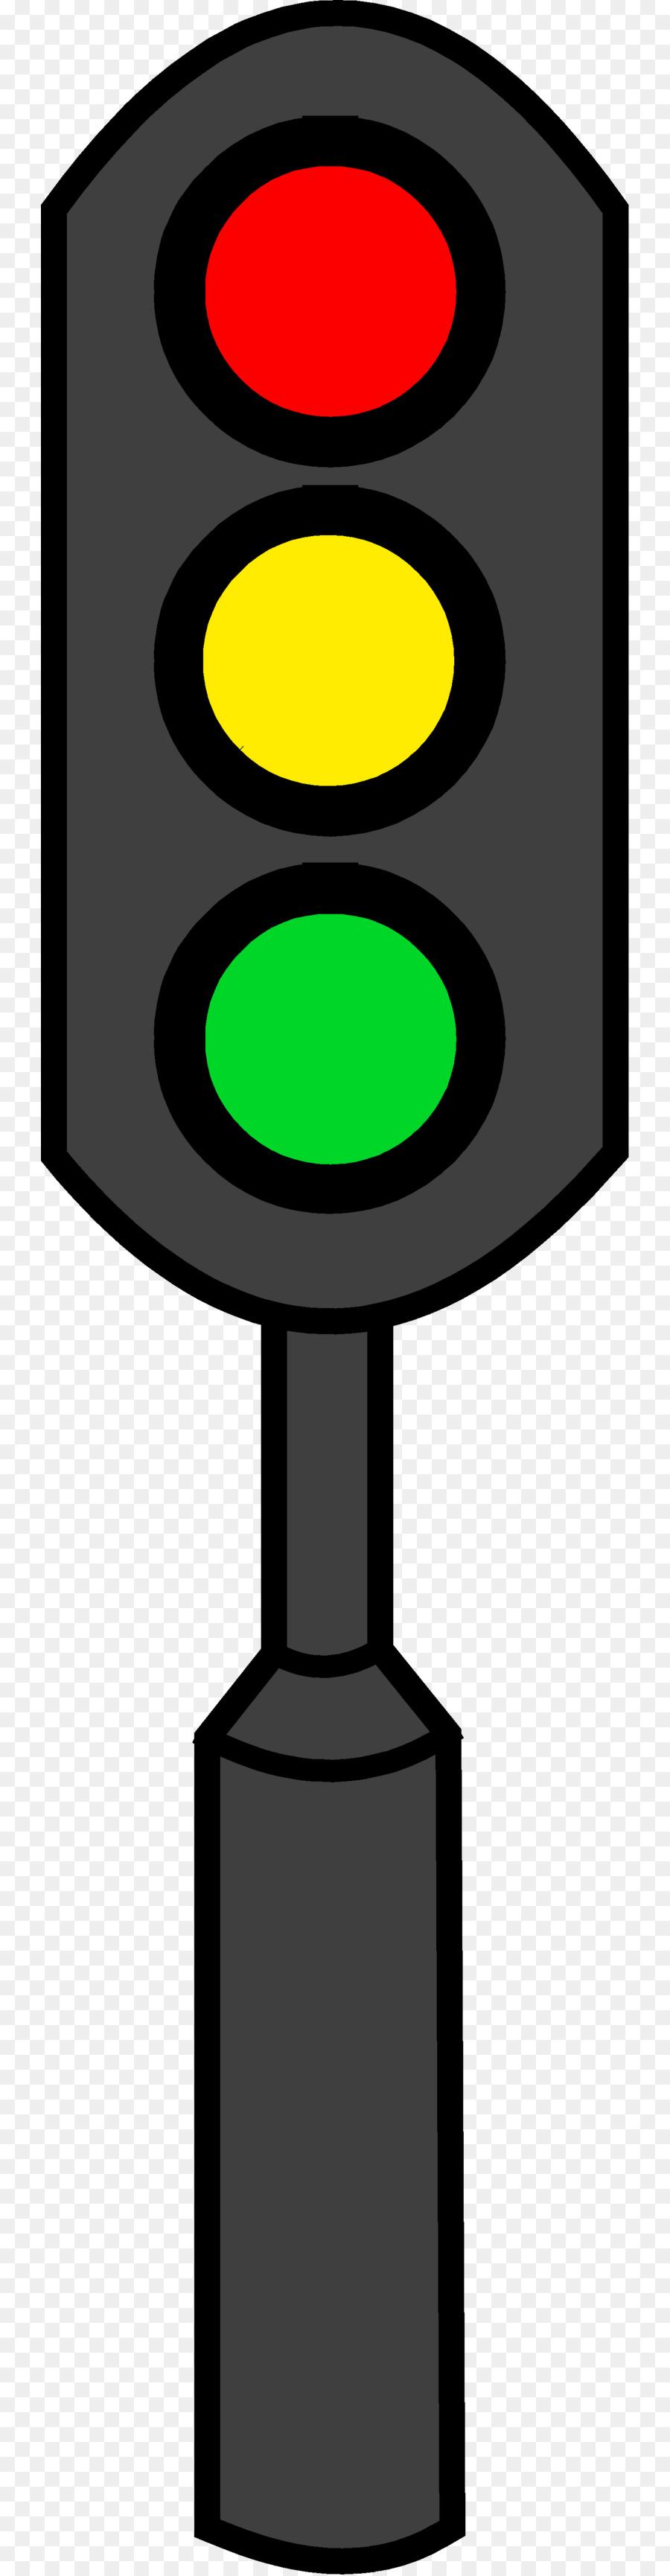 traffic light free content clip art signal cliparts png download rh kisspng com Traffic Light Clip Art Printables Blinking Traffic Light Clip Art